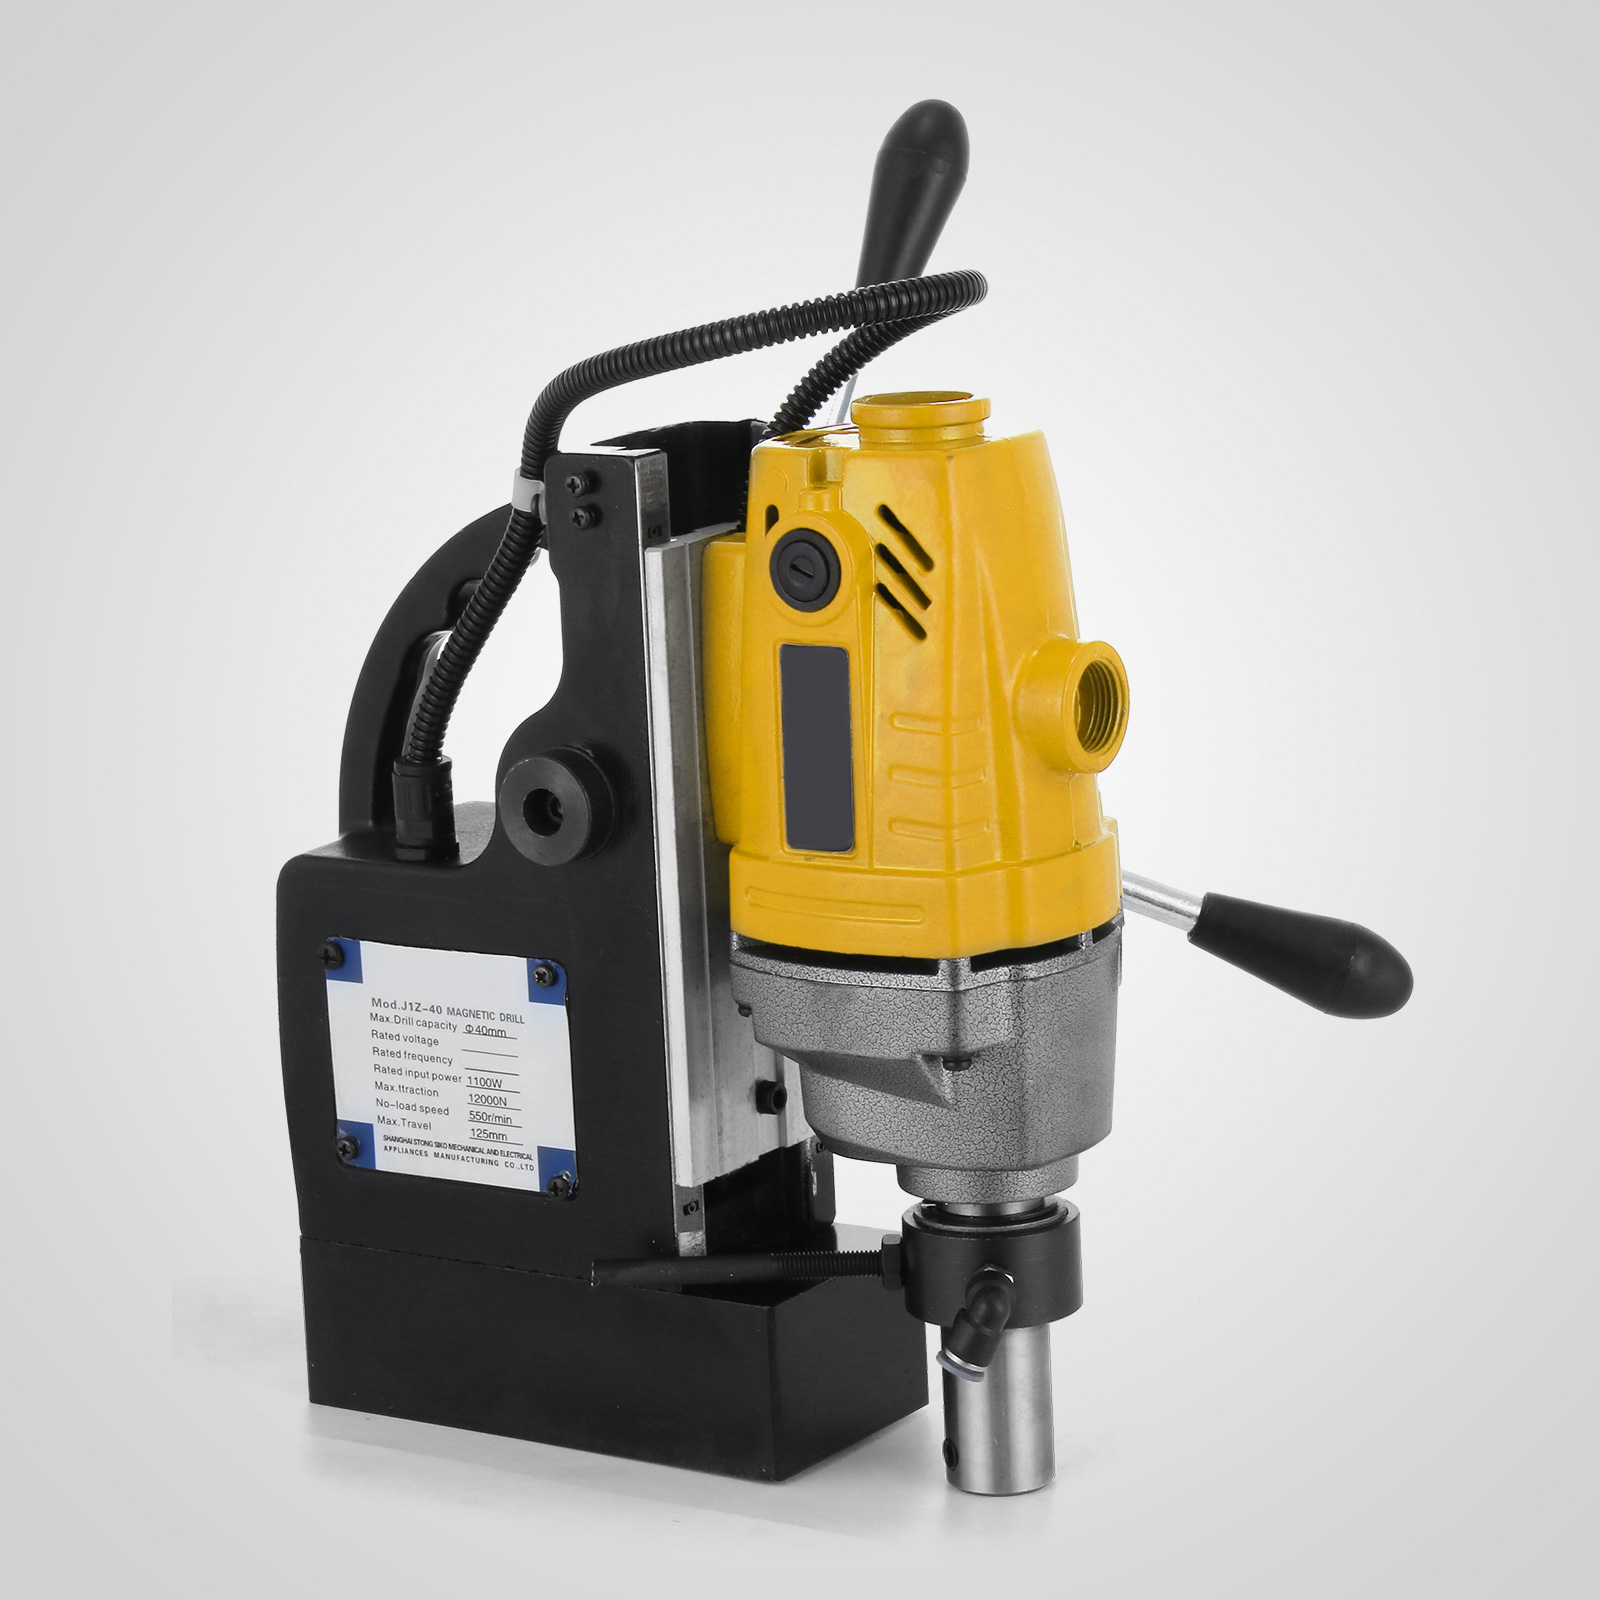 MB23-BRM35-MD40-Trapano-Perforatrice-Carotatore-Fresa-Magnetico-12-40mm-230V miniatura 41